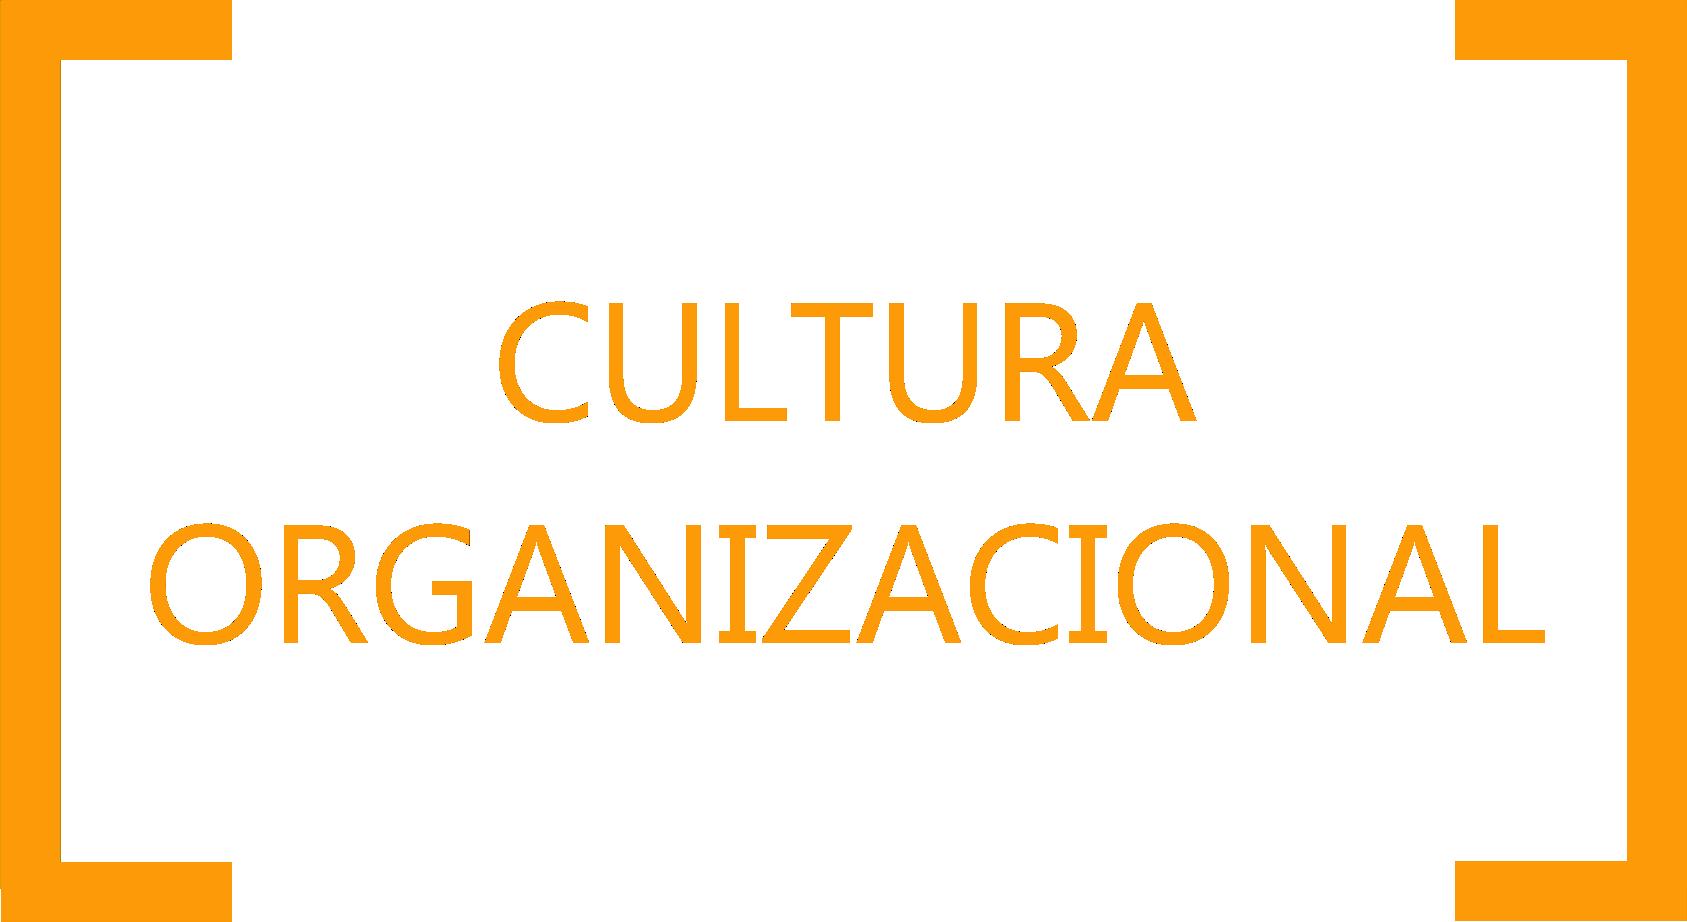 CULTURA ORGANIZCIONAL